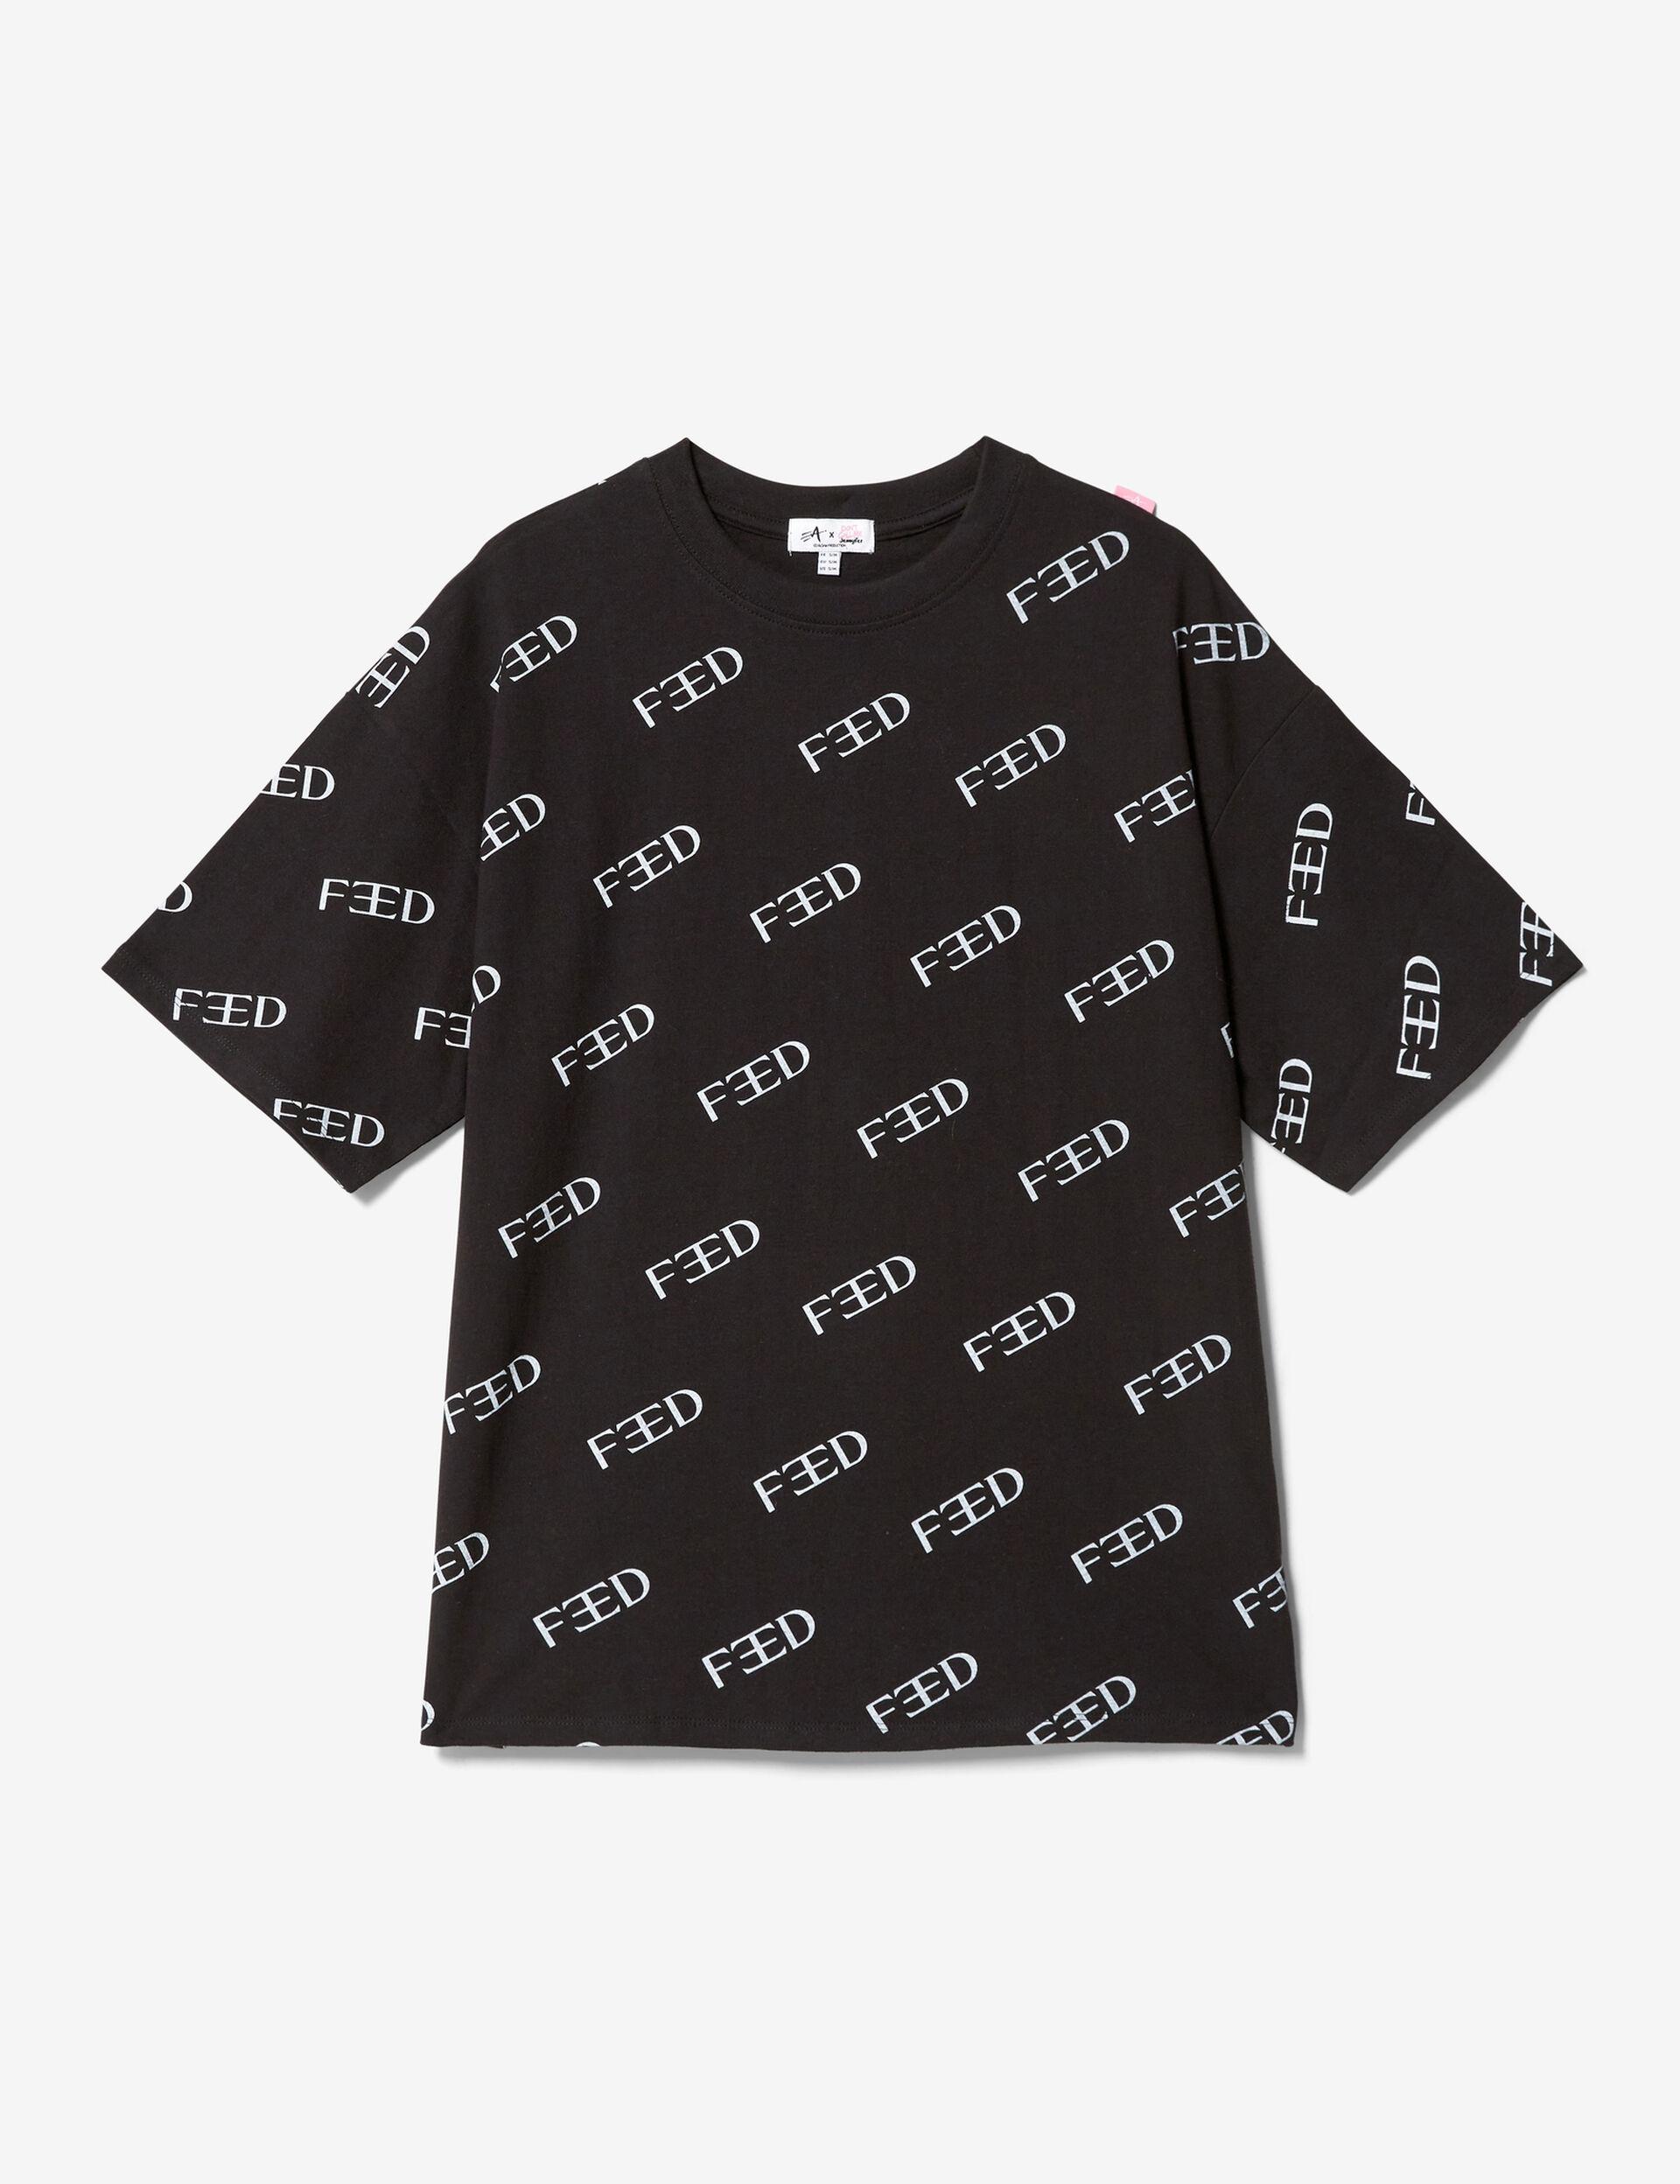 Eva Queen Feed T-shirt